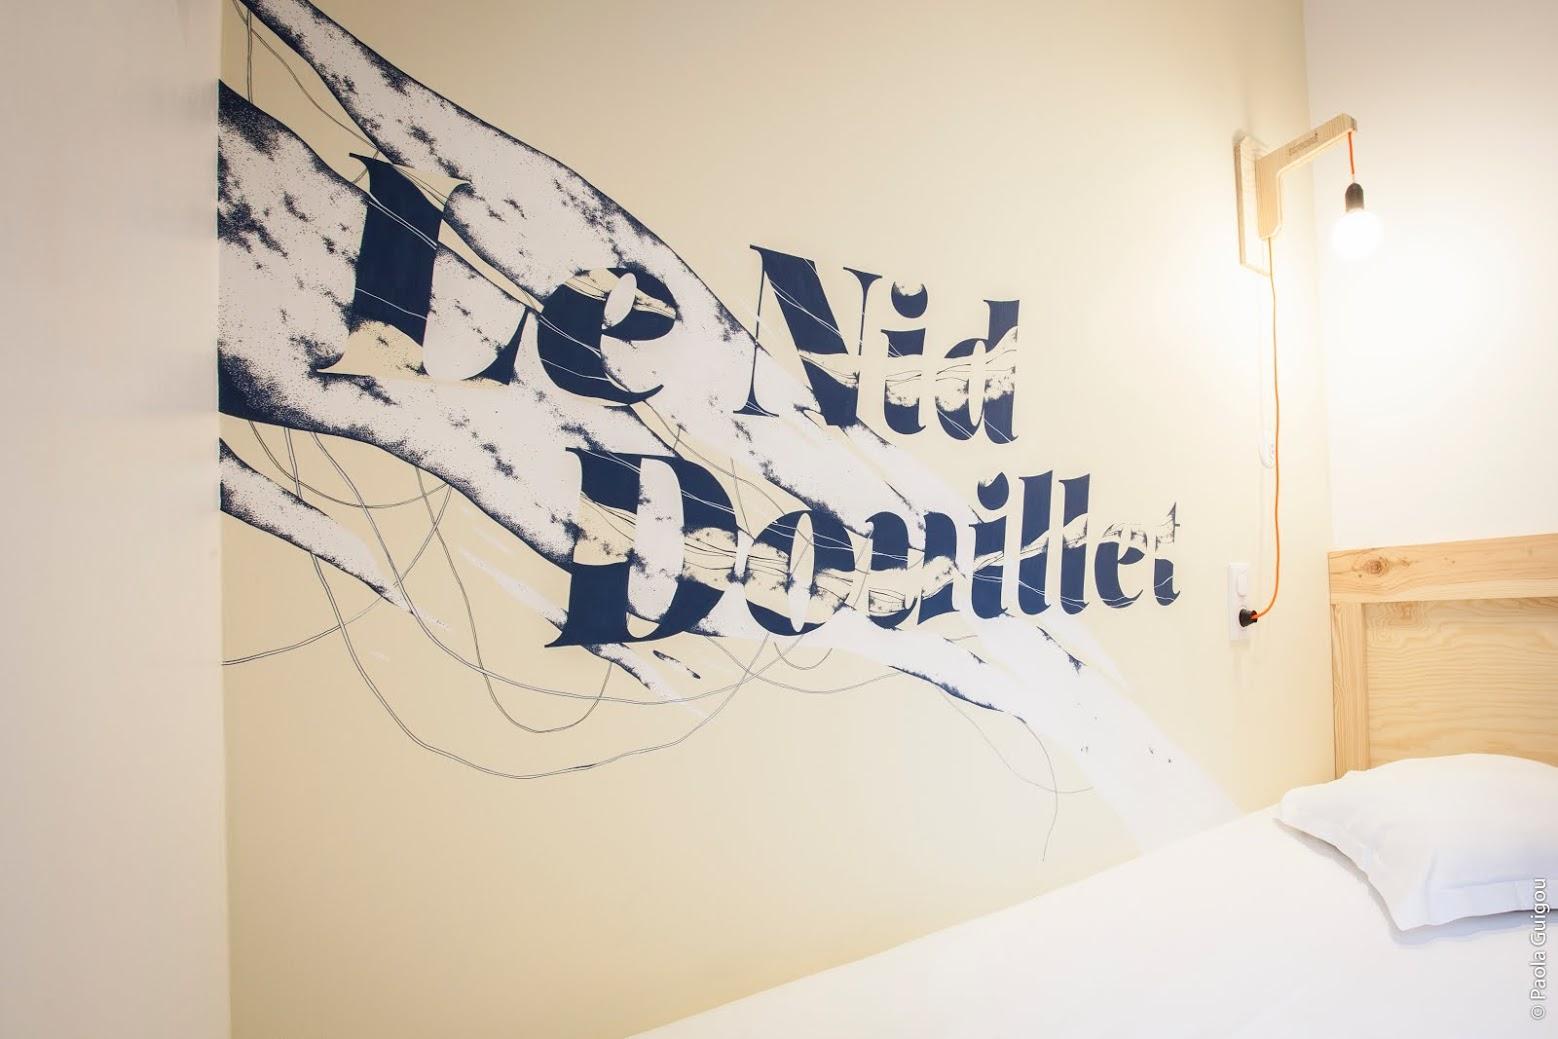 Room 108 by MISSY - (c) Paola Guigou - Graffalgar - 307